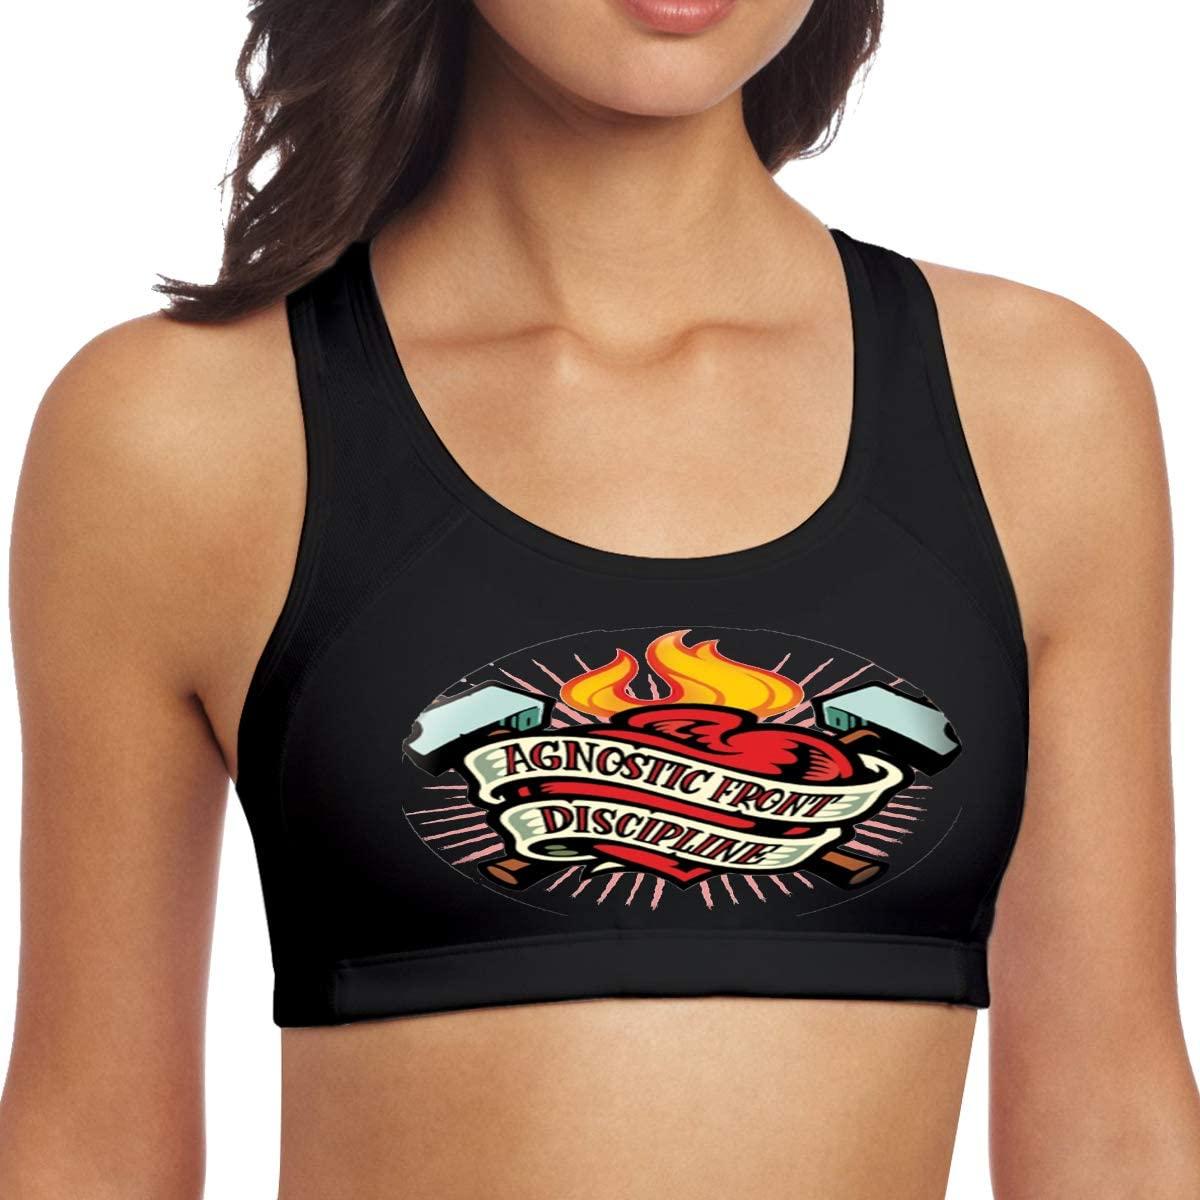 Corashopping Agnostic Front Women Fashion Sports Tank Black